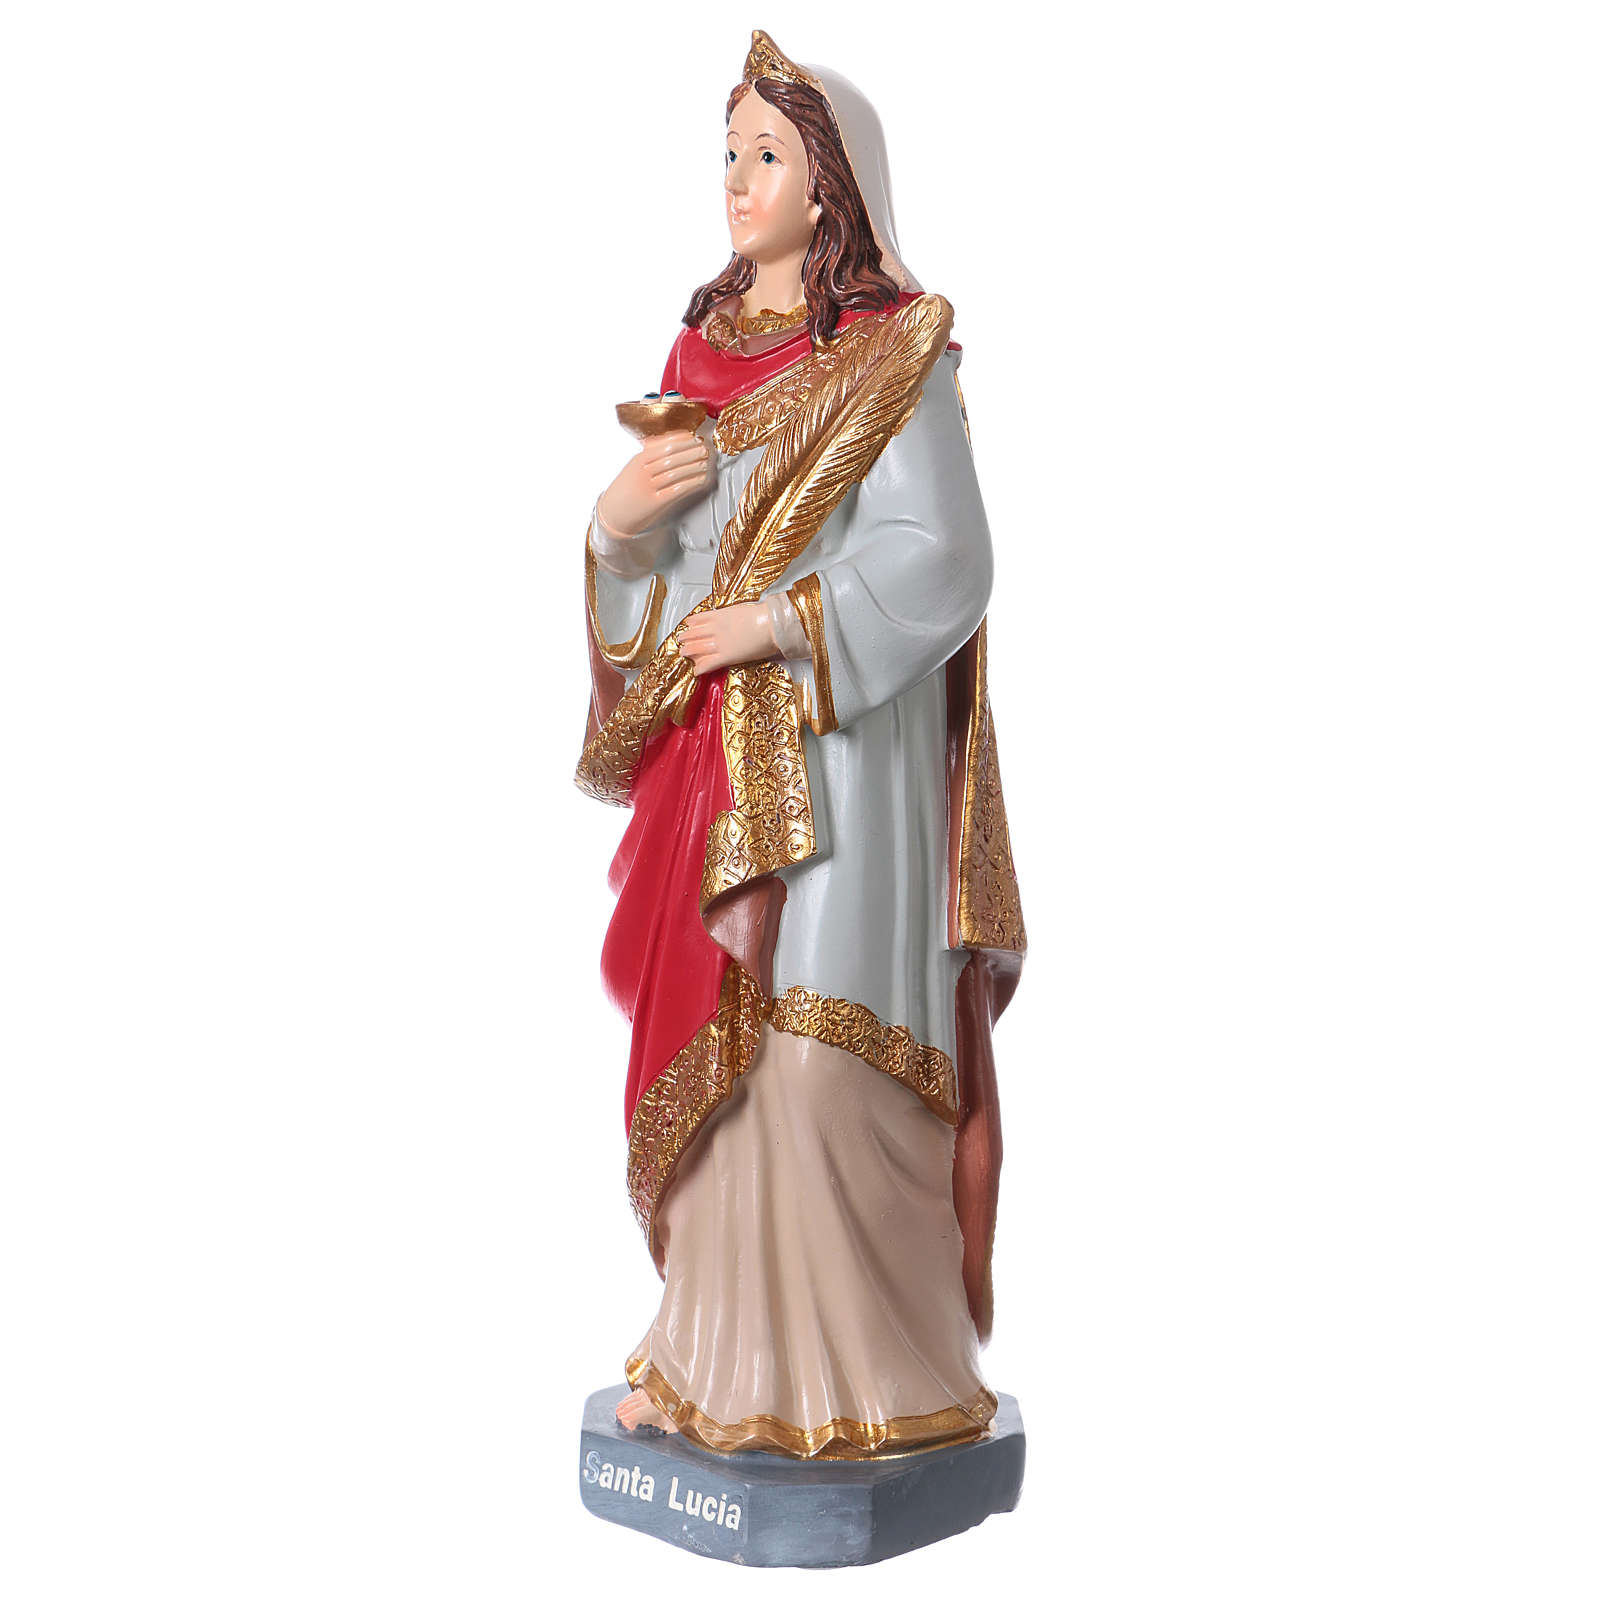 Santa Lucia statua 20 cm resina 4